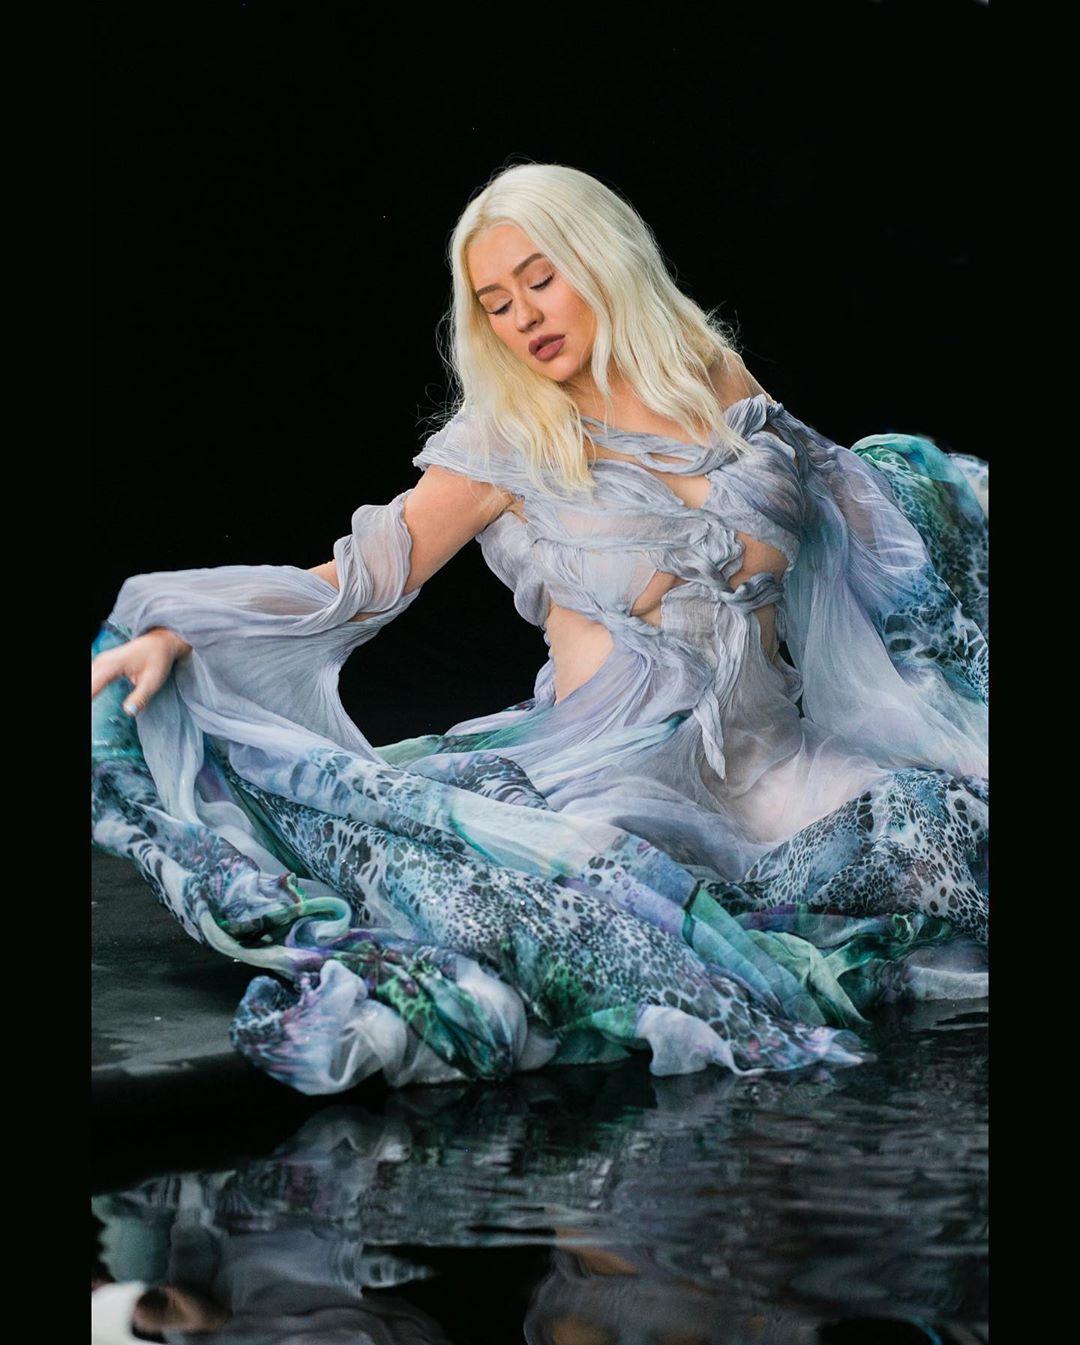 christina aguilera 2020 - Christina Aguilera - Reflection (2020)